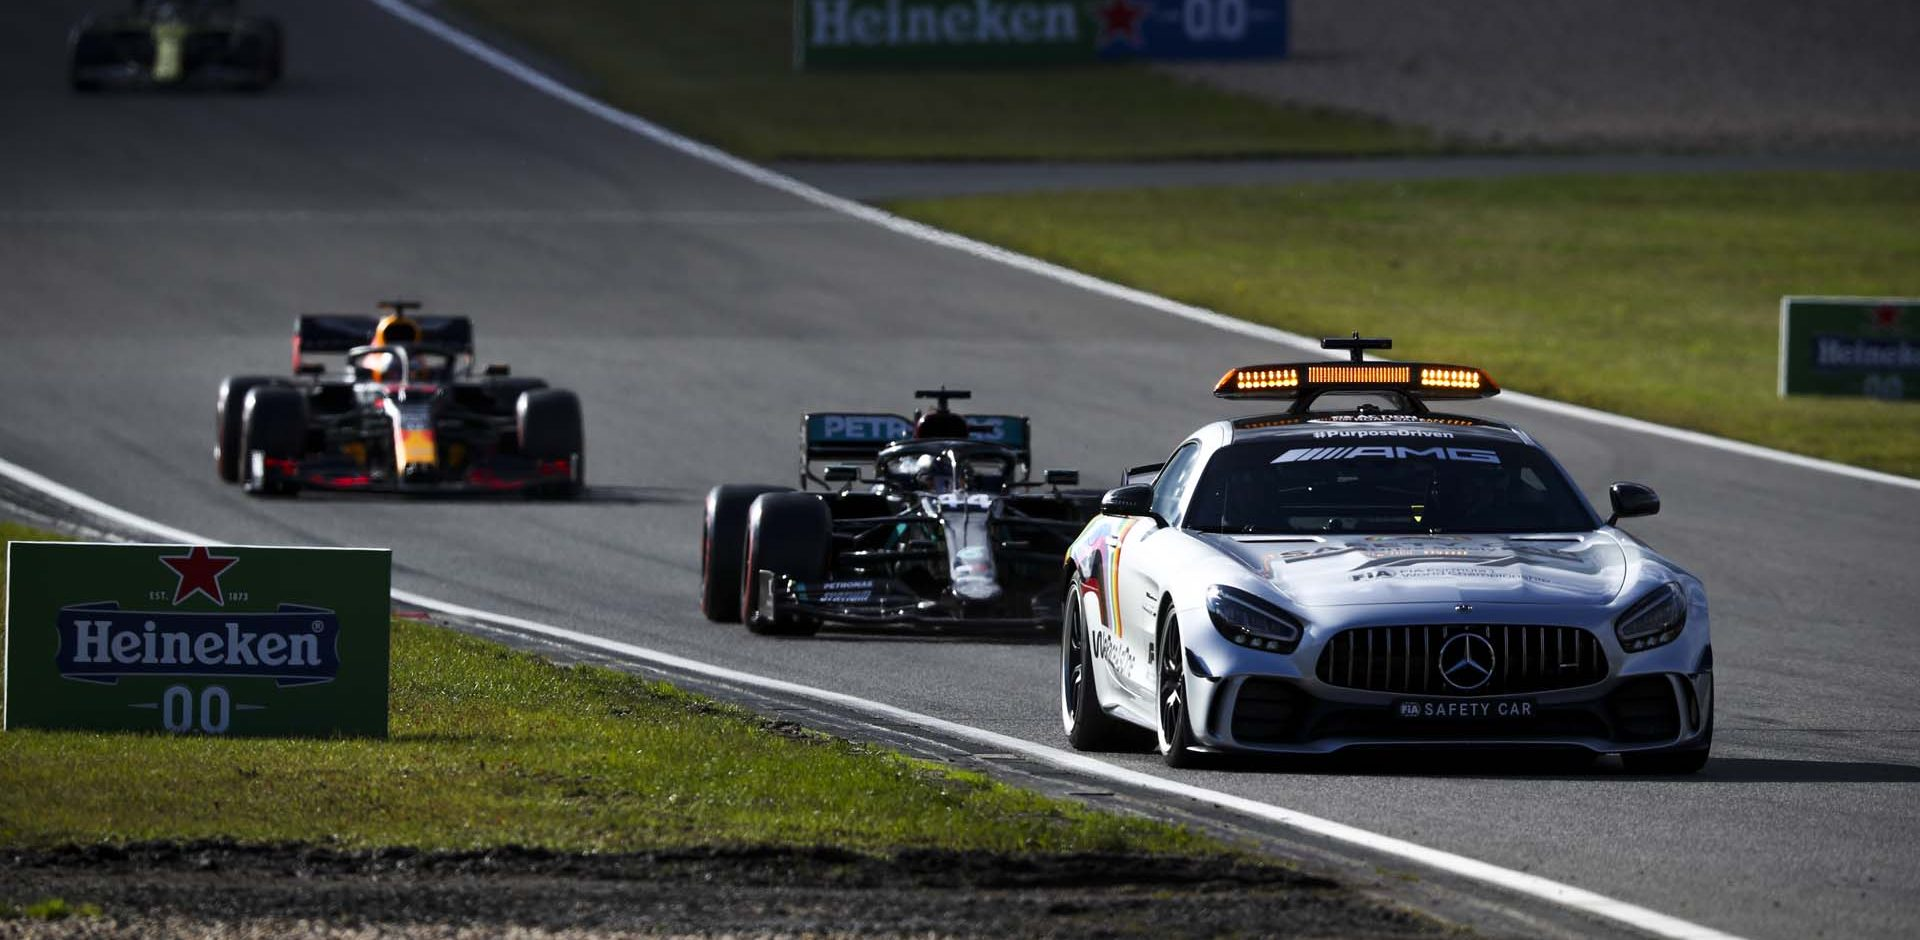 2020 Eifel Grand Prix, Sunday - LAT Images Safety Car Lewis Hamilton Max Verstappen